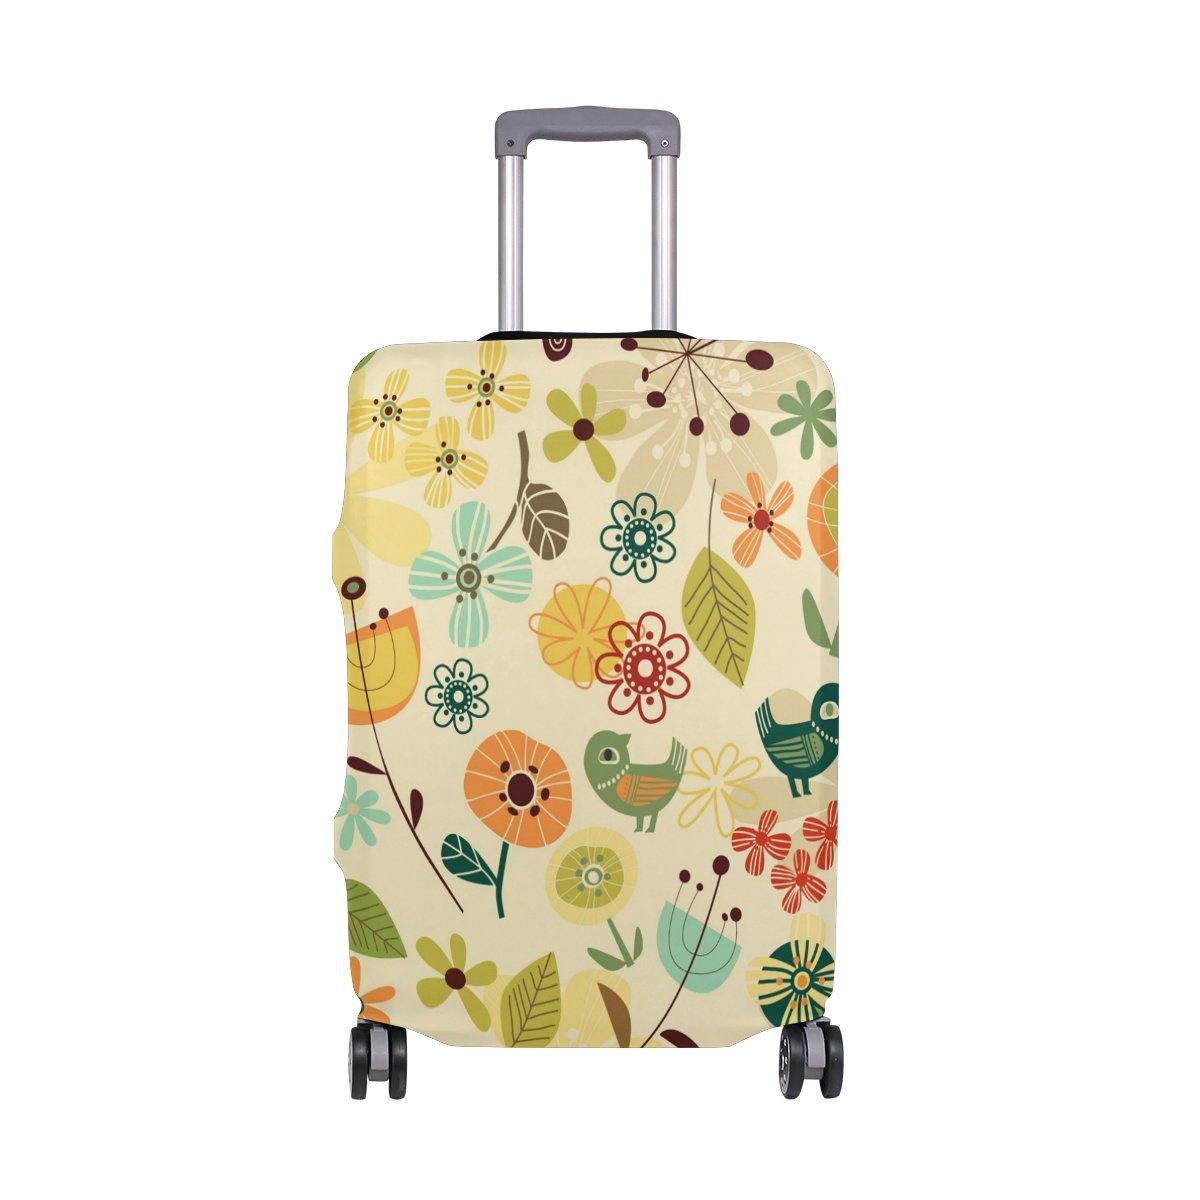 Summer Spring Birds Floral Flowers Vintage Suitcase Luggage Cover Protector for Travel Kids Men Women